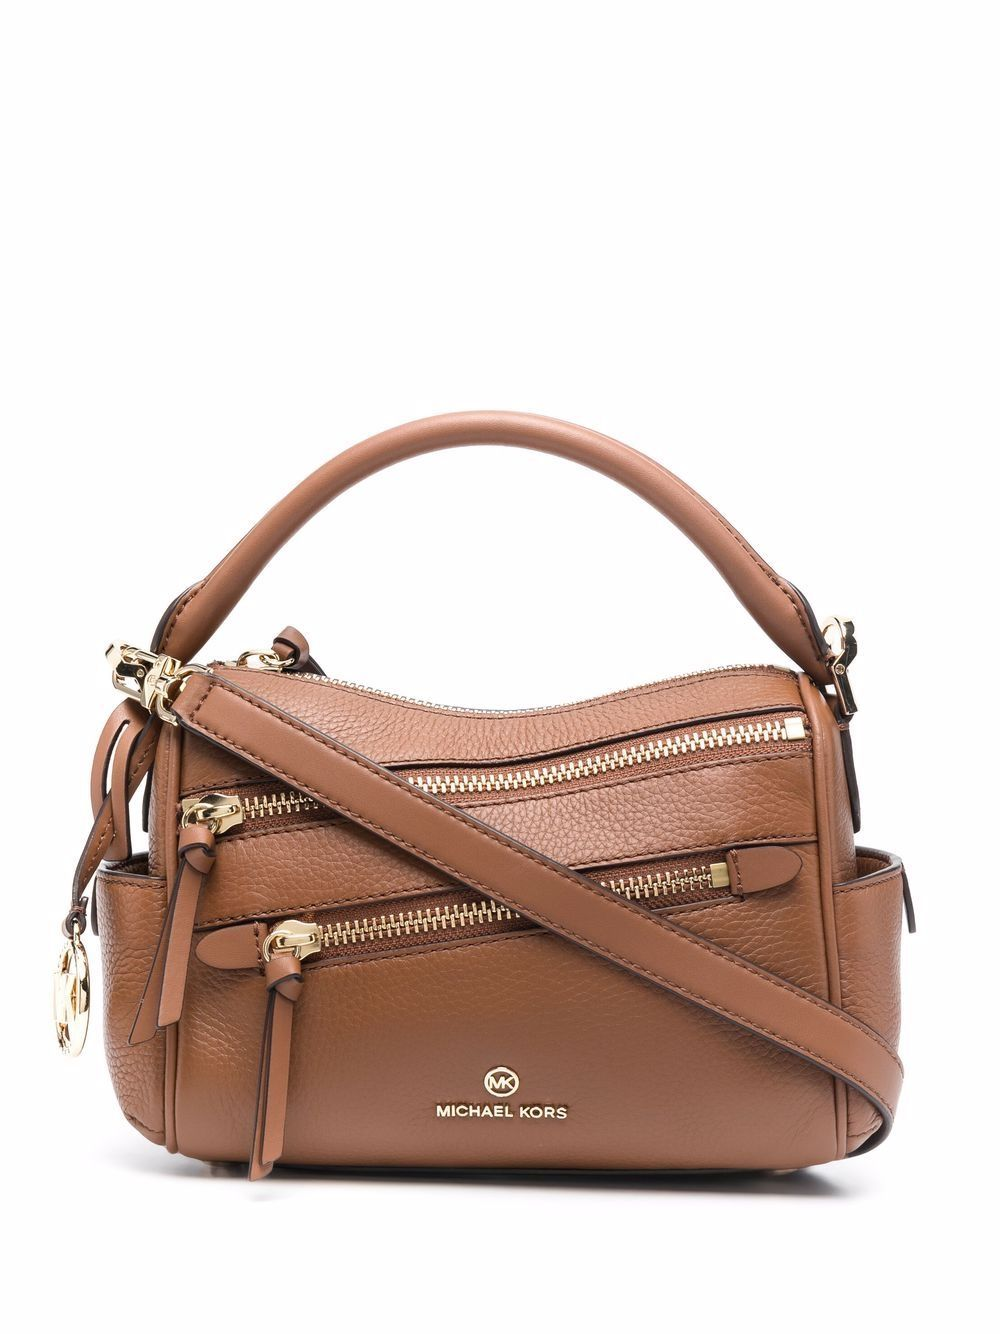 Lorimer leather small handbag